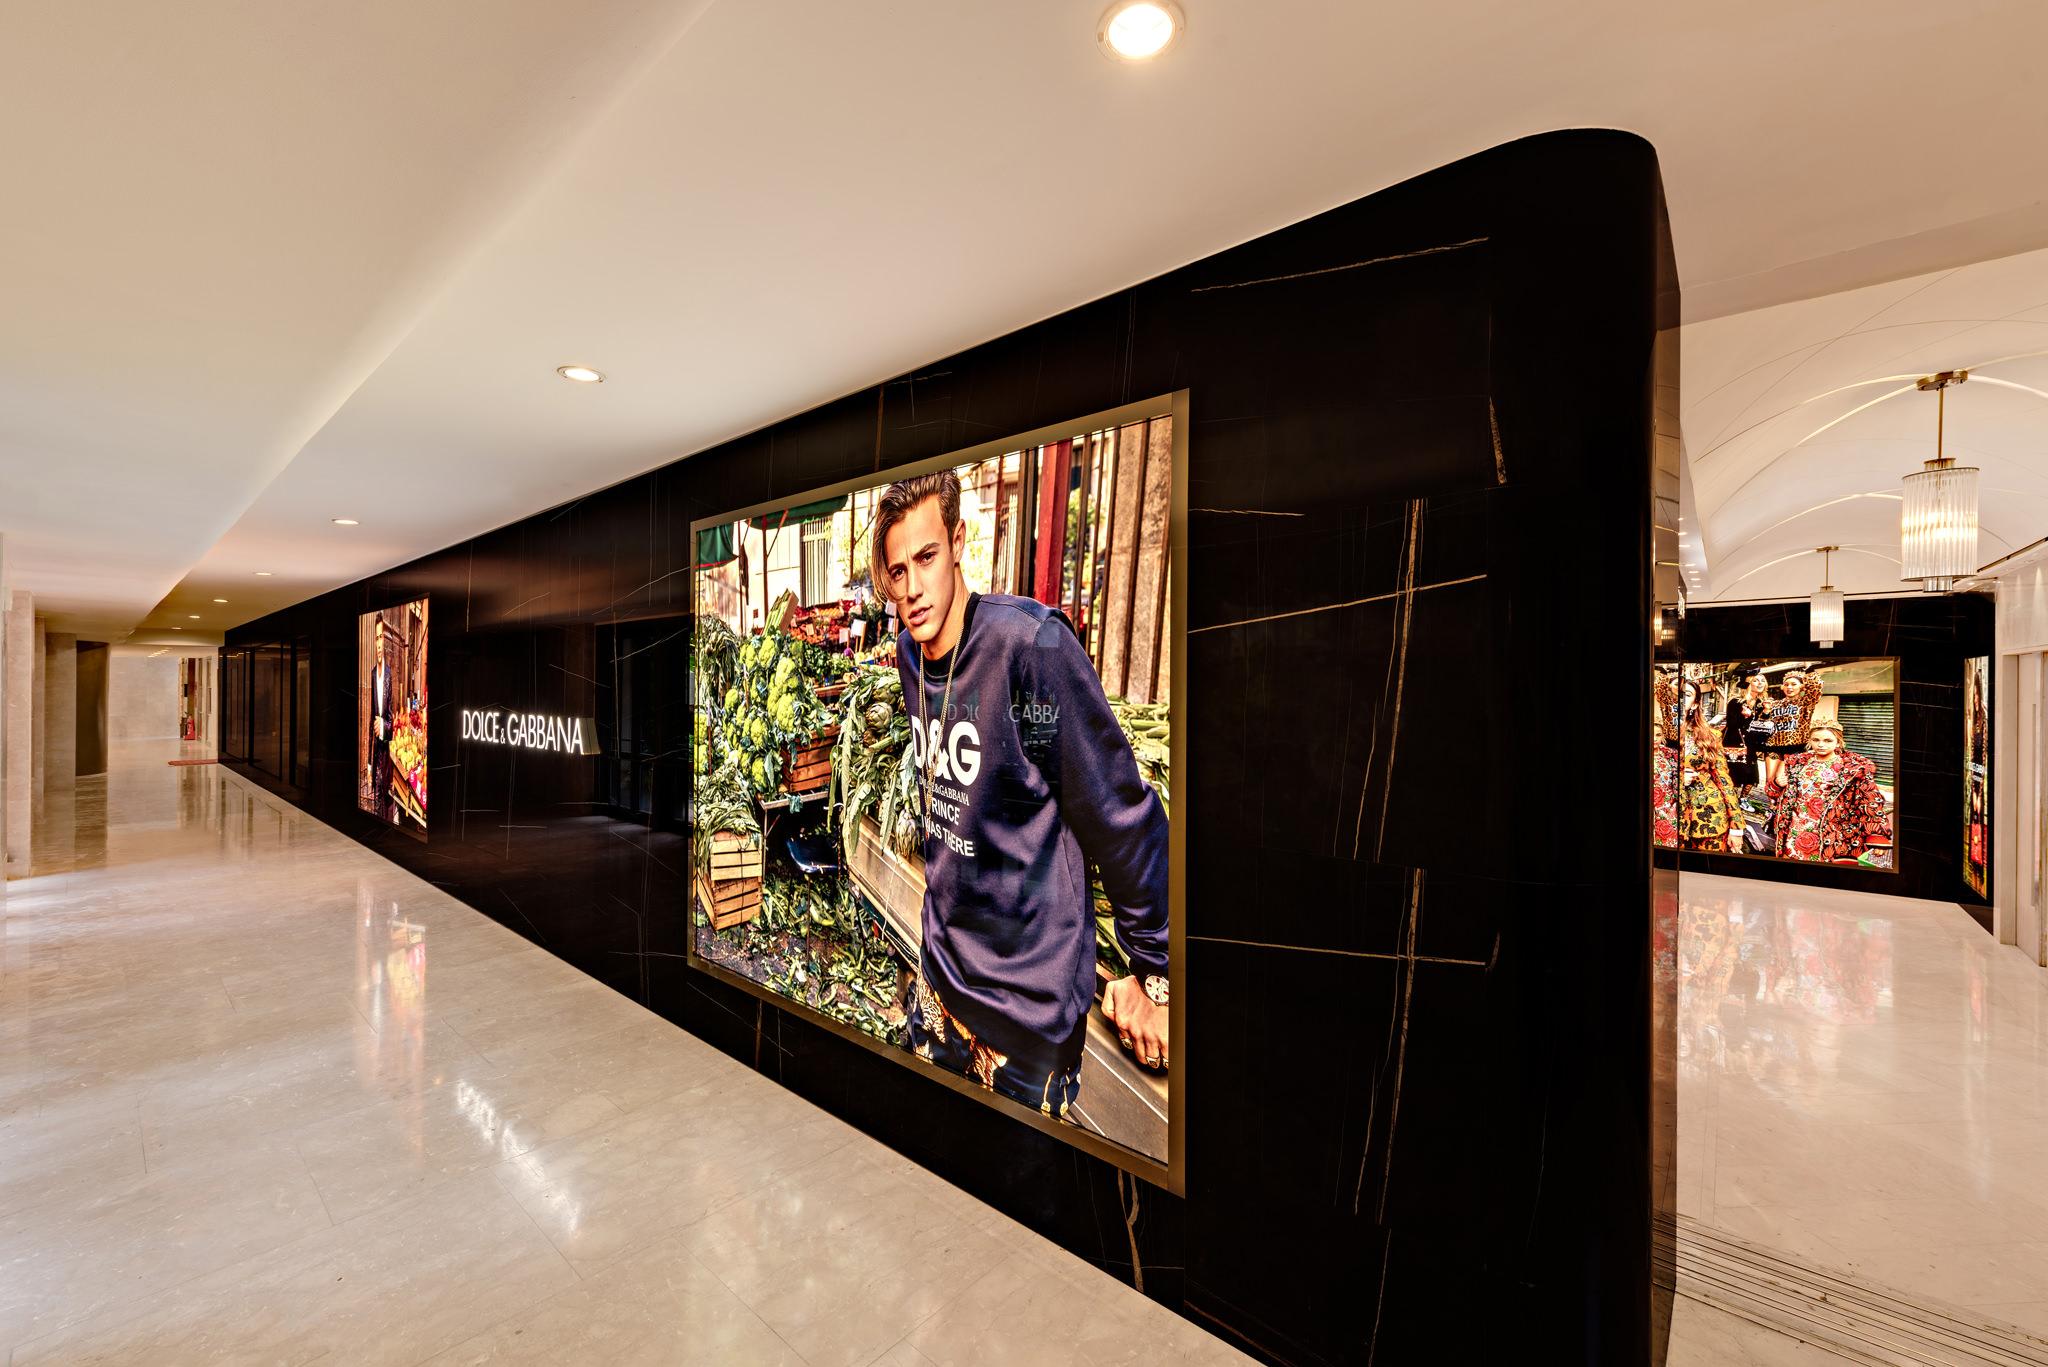 20171011 - Dolce & Gabbana - HCM - Commercial - Interior - Store - Retouch 0262.jpg